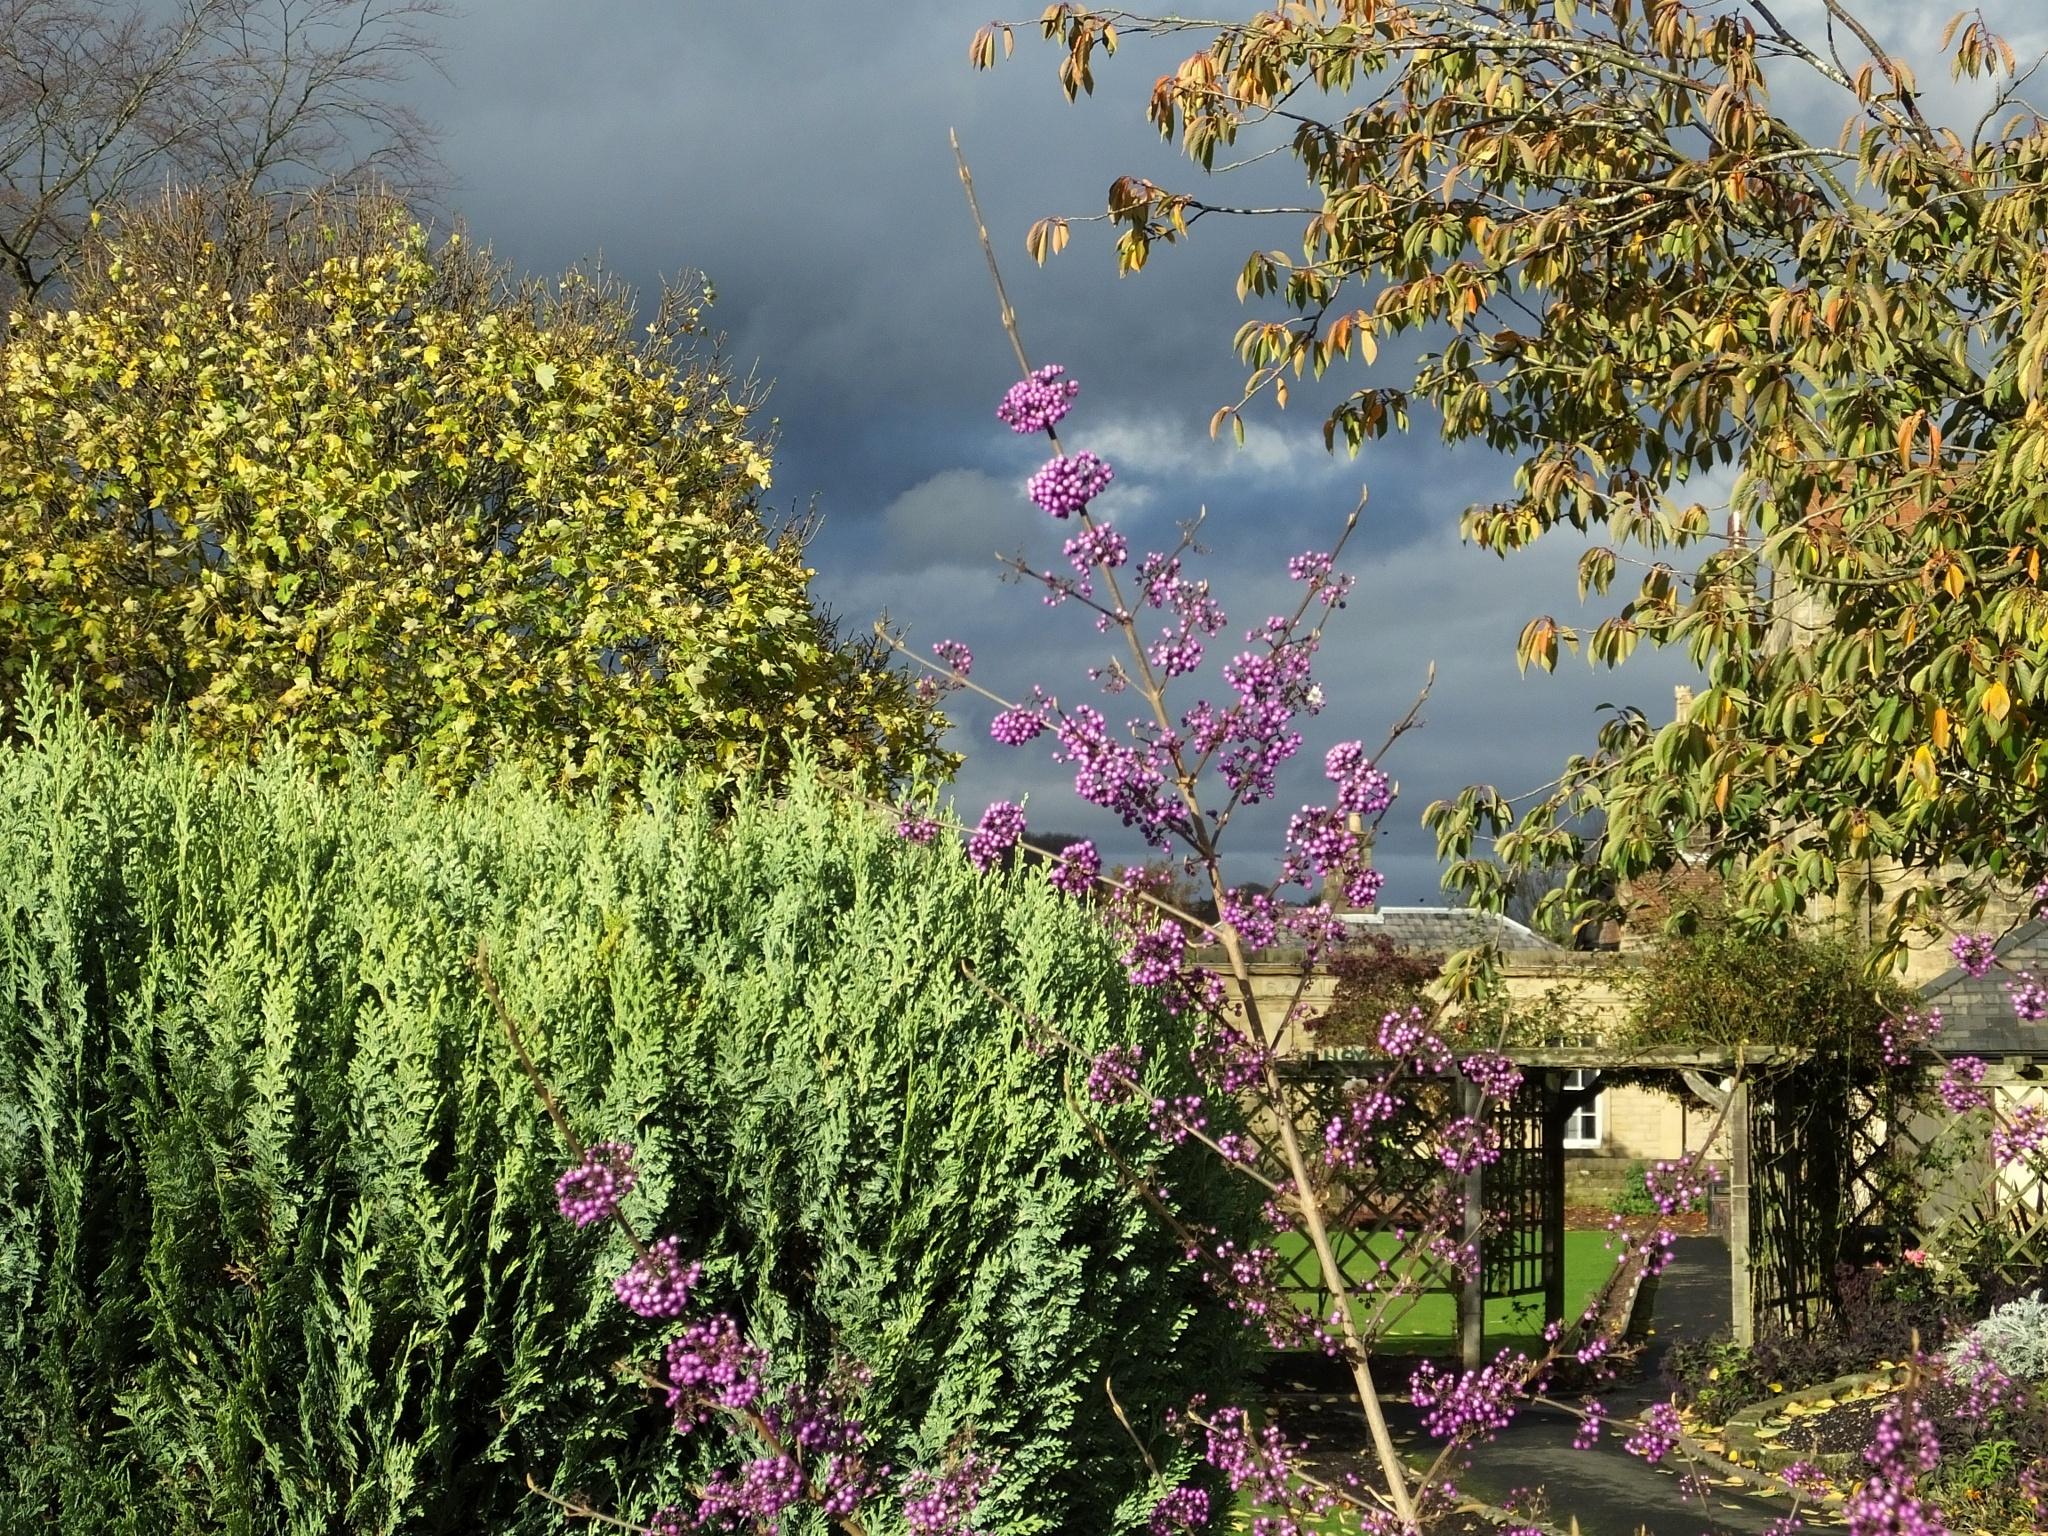 November Garden by ianmoorcroft